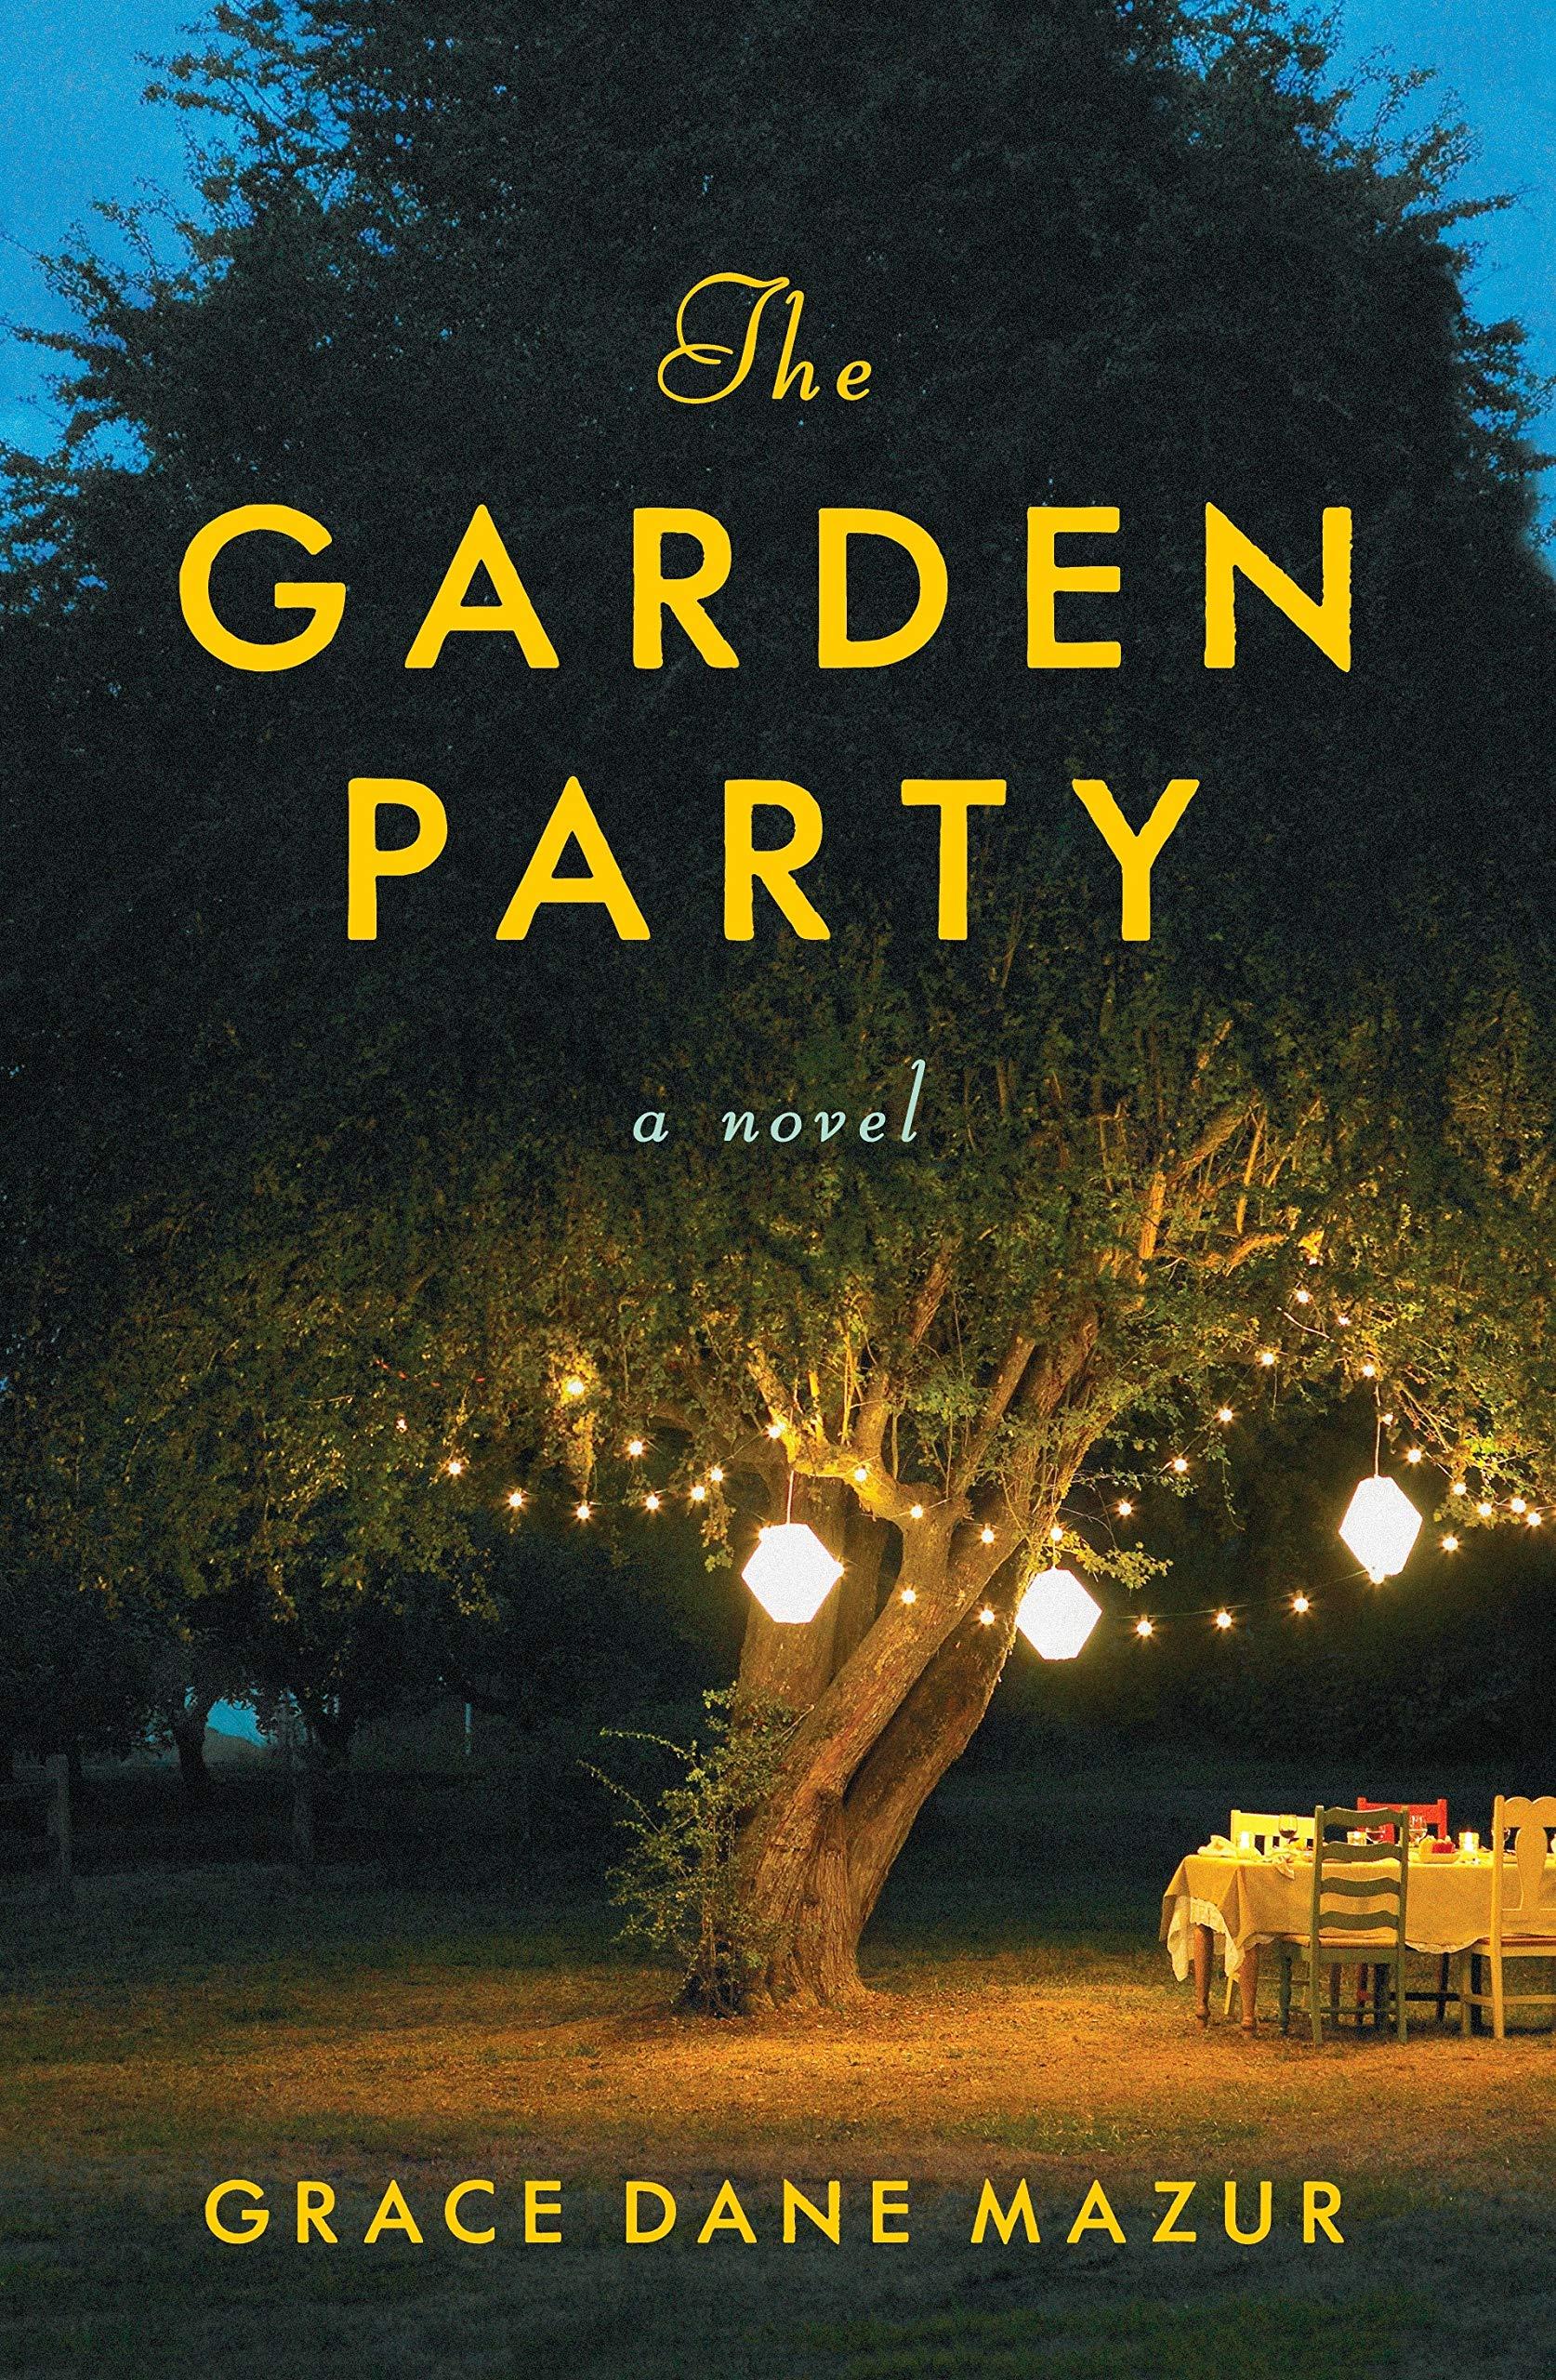 The Garden Party: A Novel: Grace Dane Mazur: 9780399179723: Amazon ...